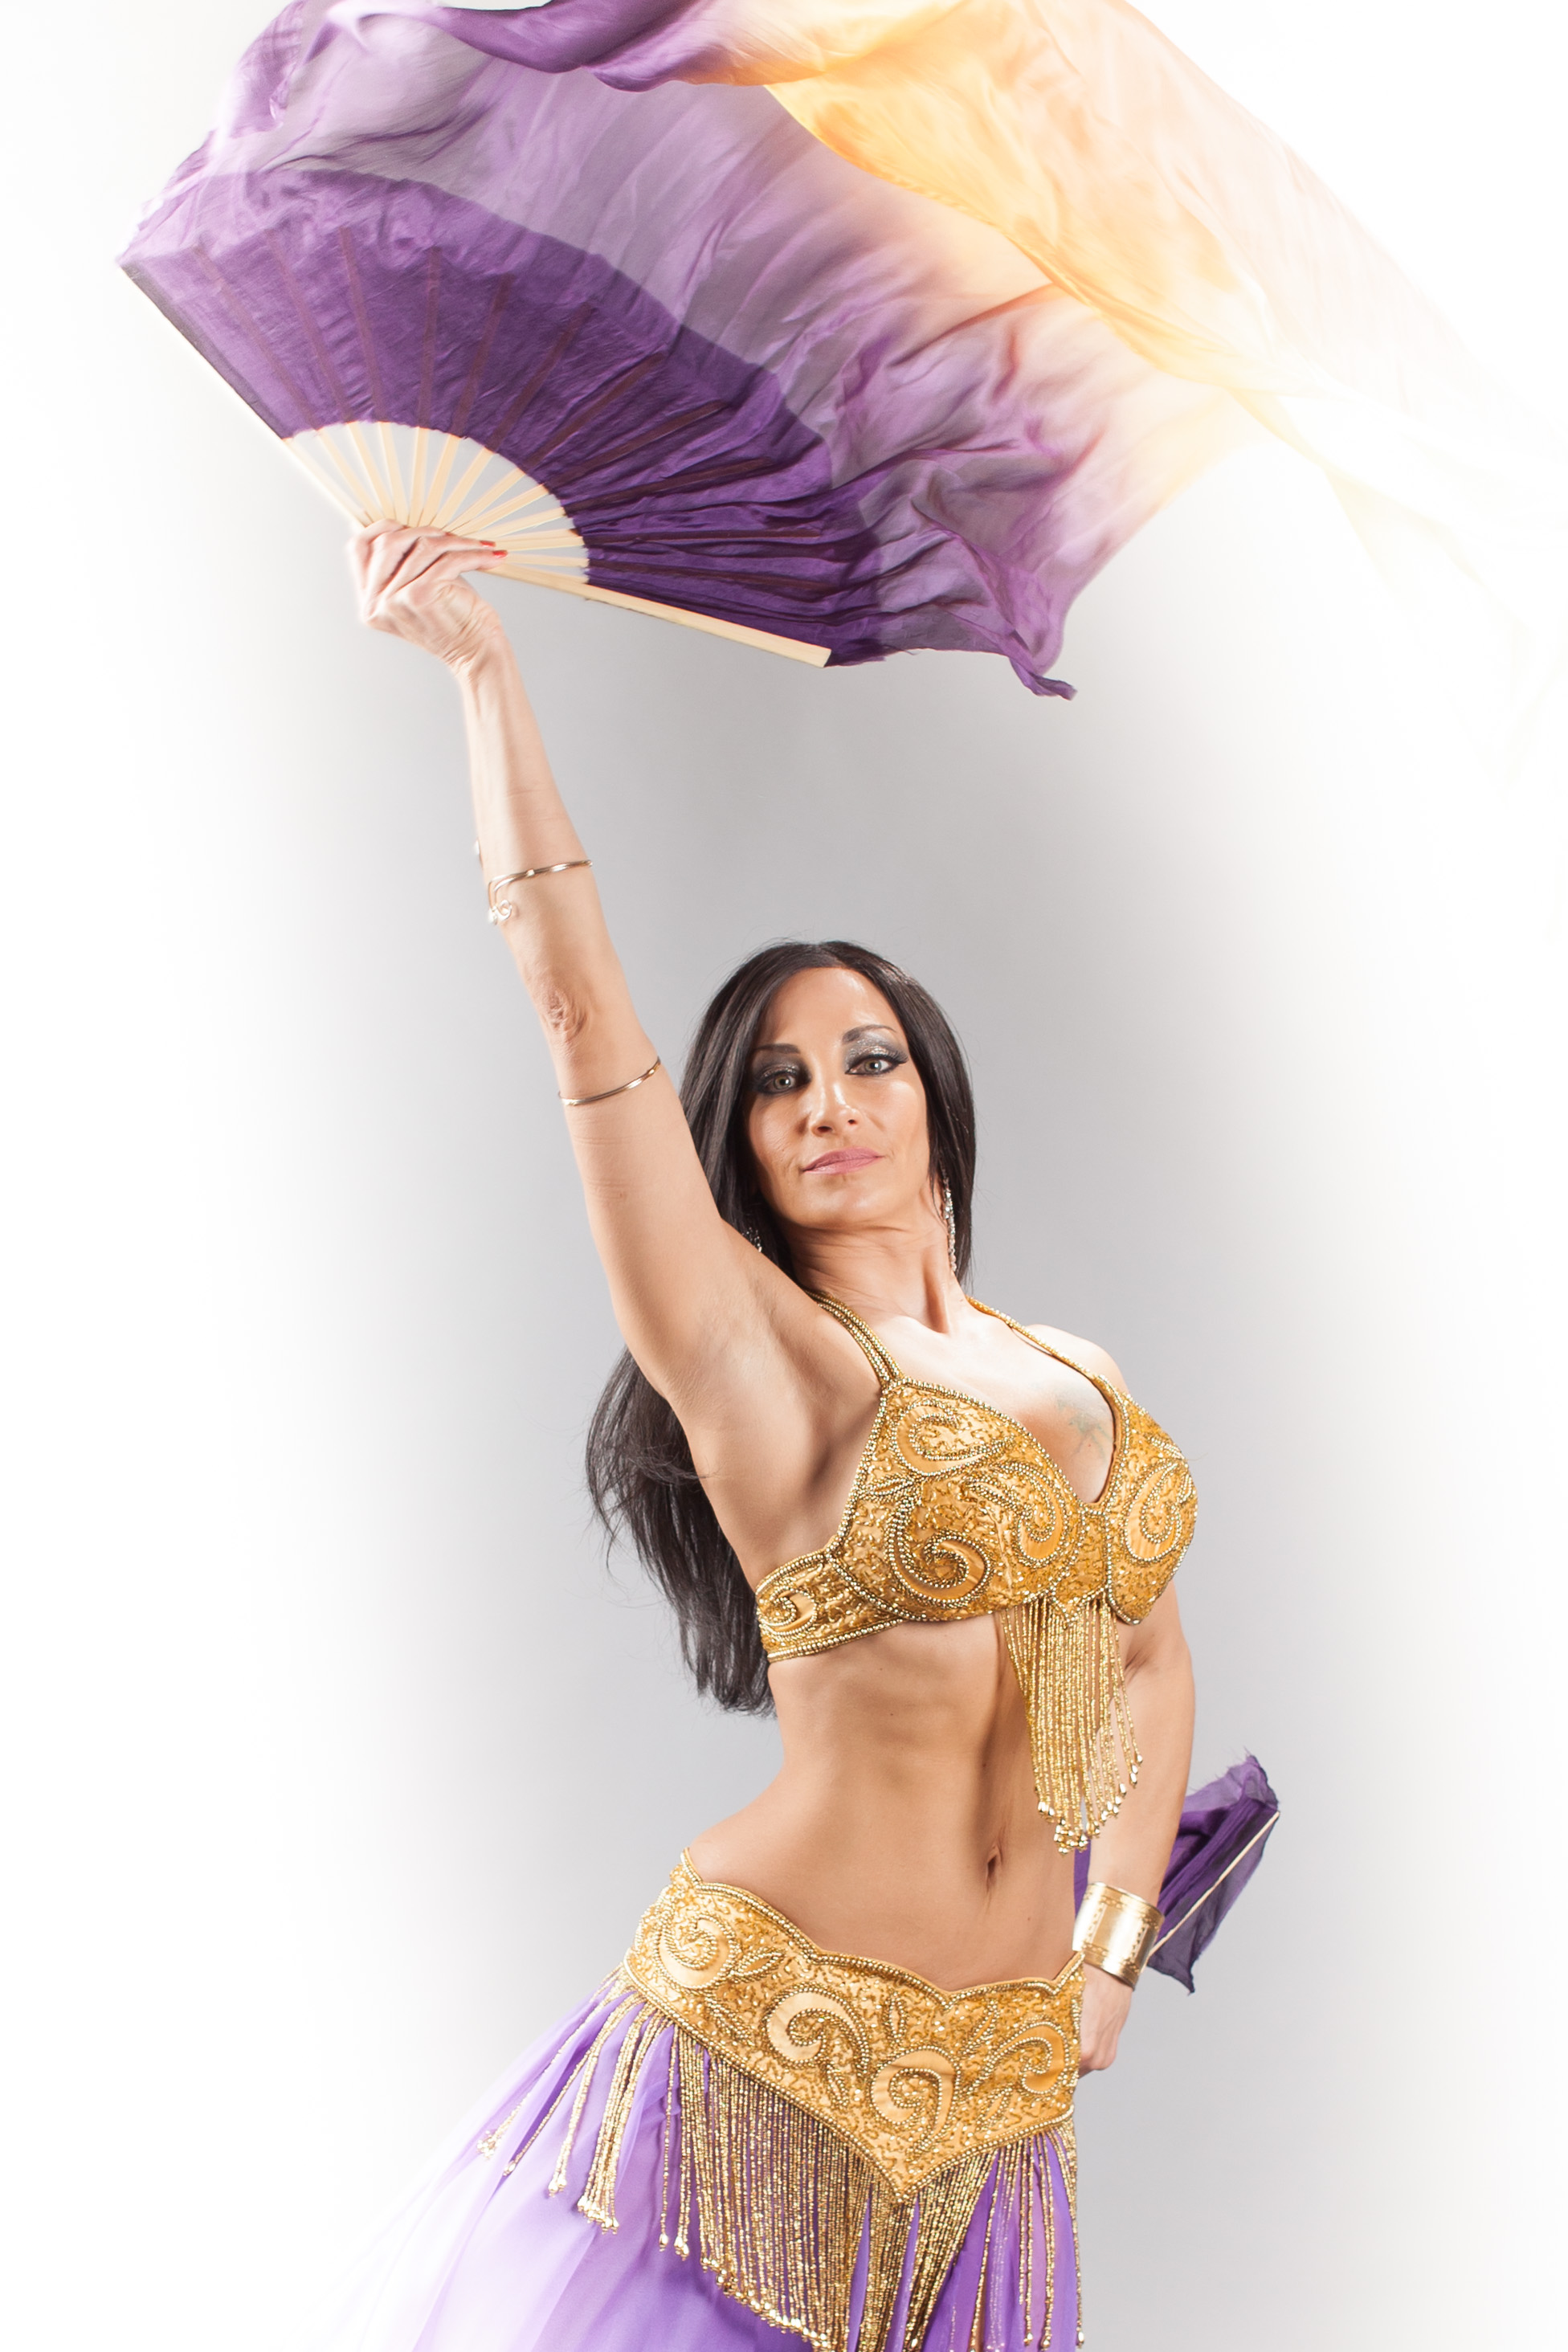 Mahsati Dancer unitymike photo (97 of 235).jpg